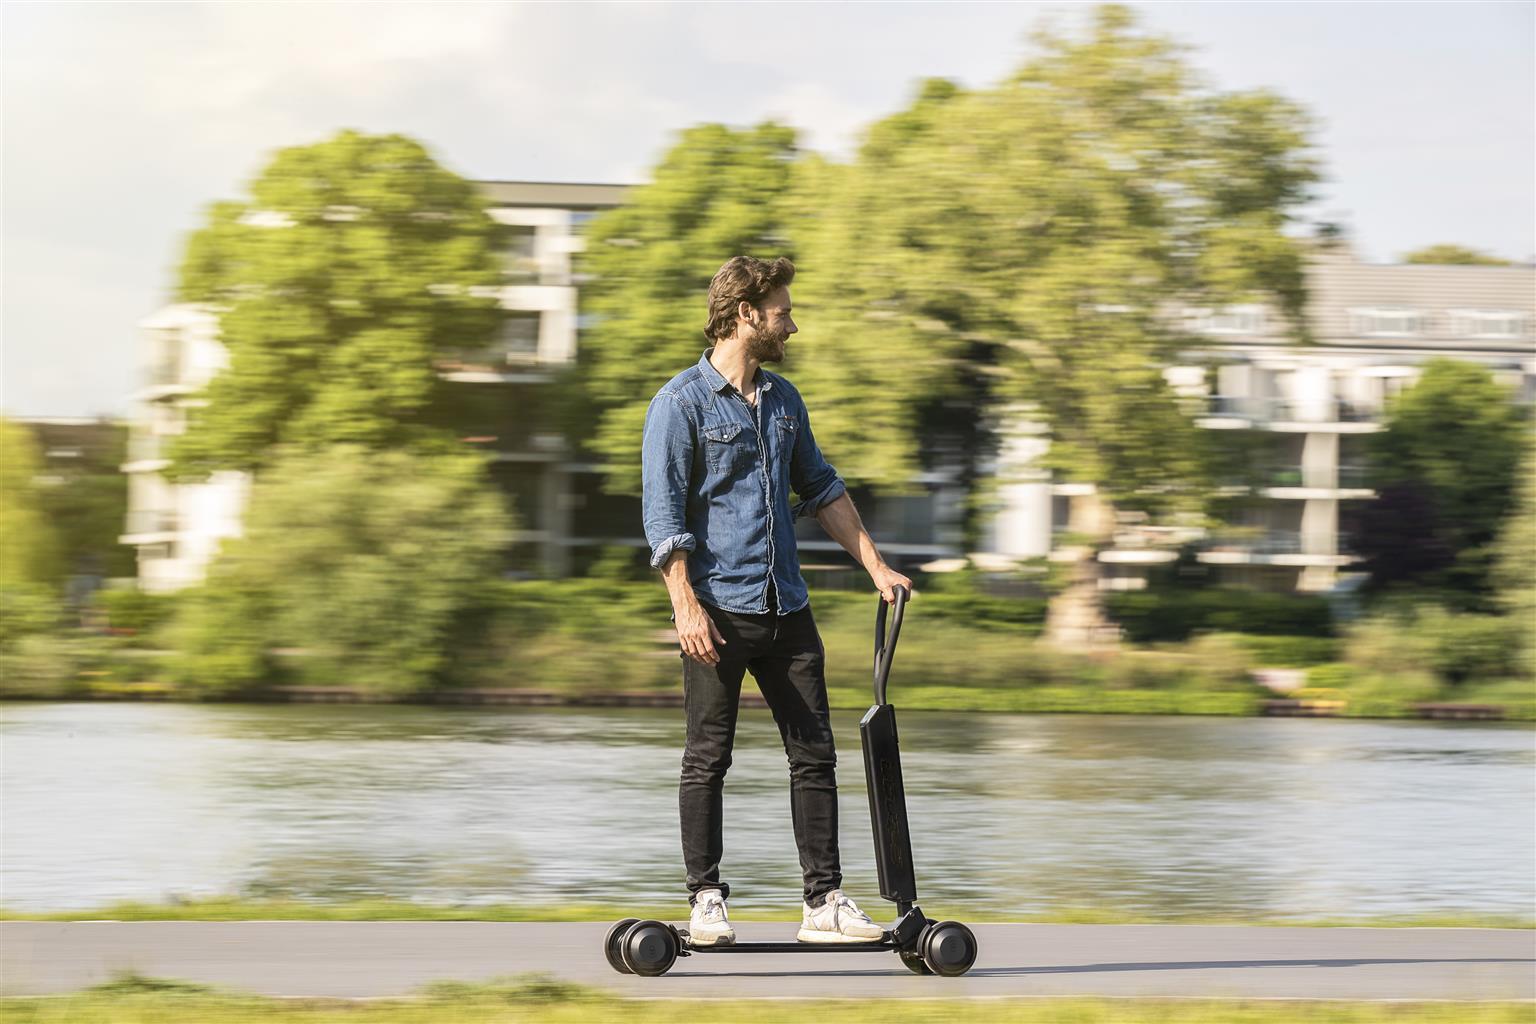 Audi e-tron Scooter (07/2019)